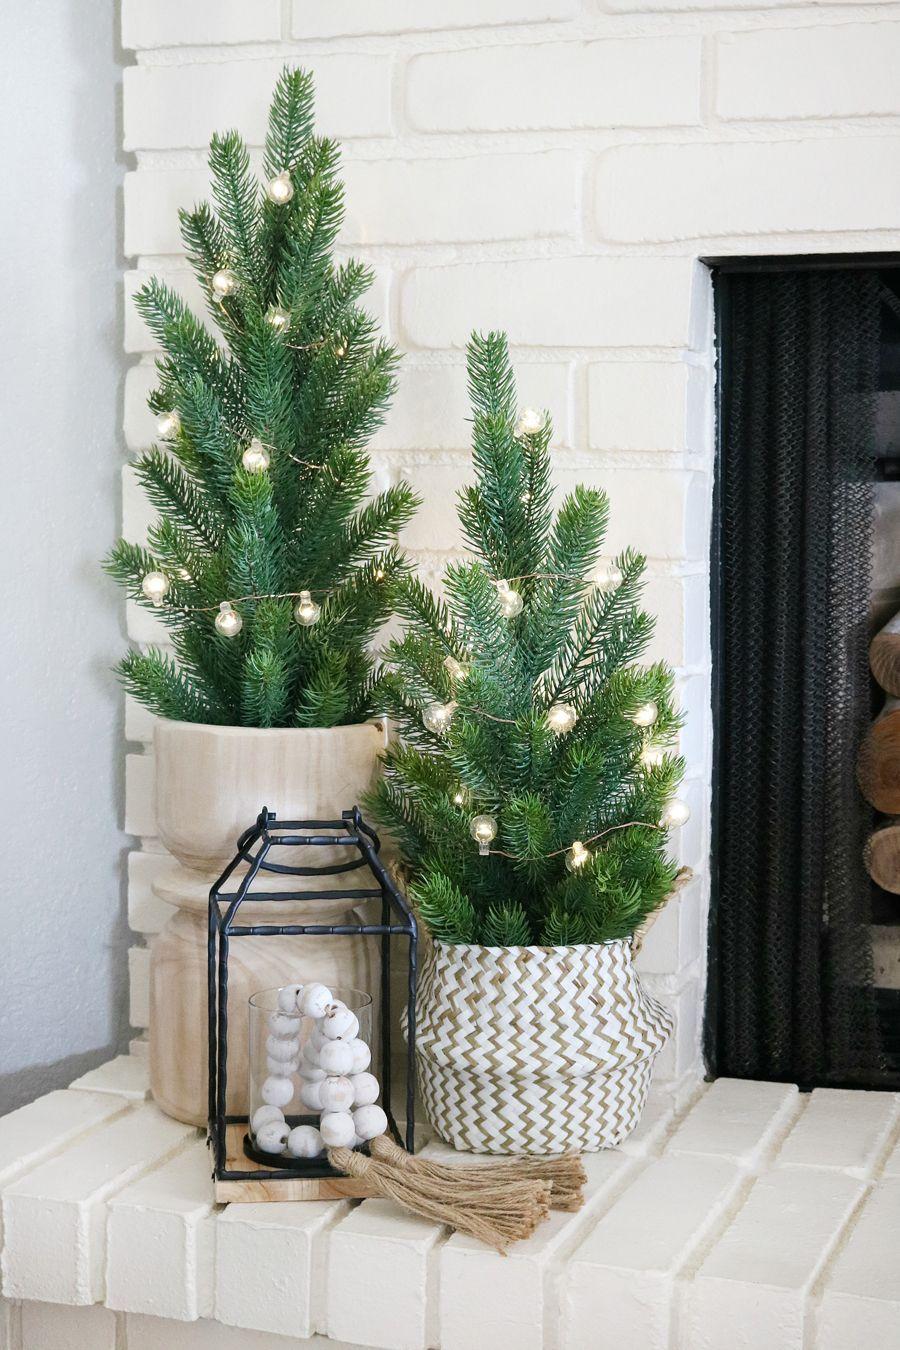 Diy House Decor Ideas Tips For Bedroom Decor Ideas Tips For To Know Christmas Mantel Decorations Scandinavian Christmas Decorations Boho Christmas Decor